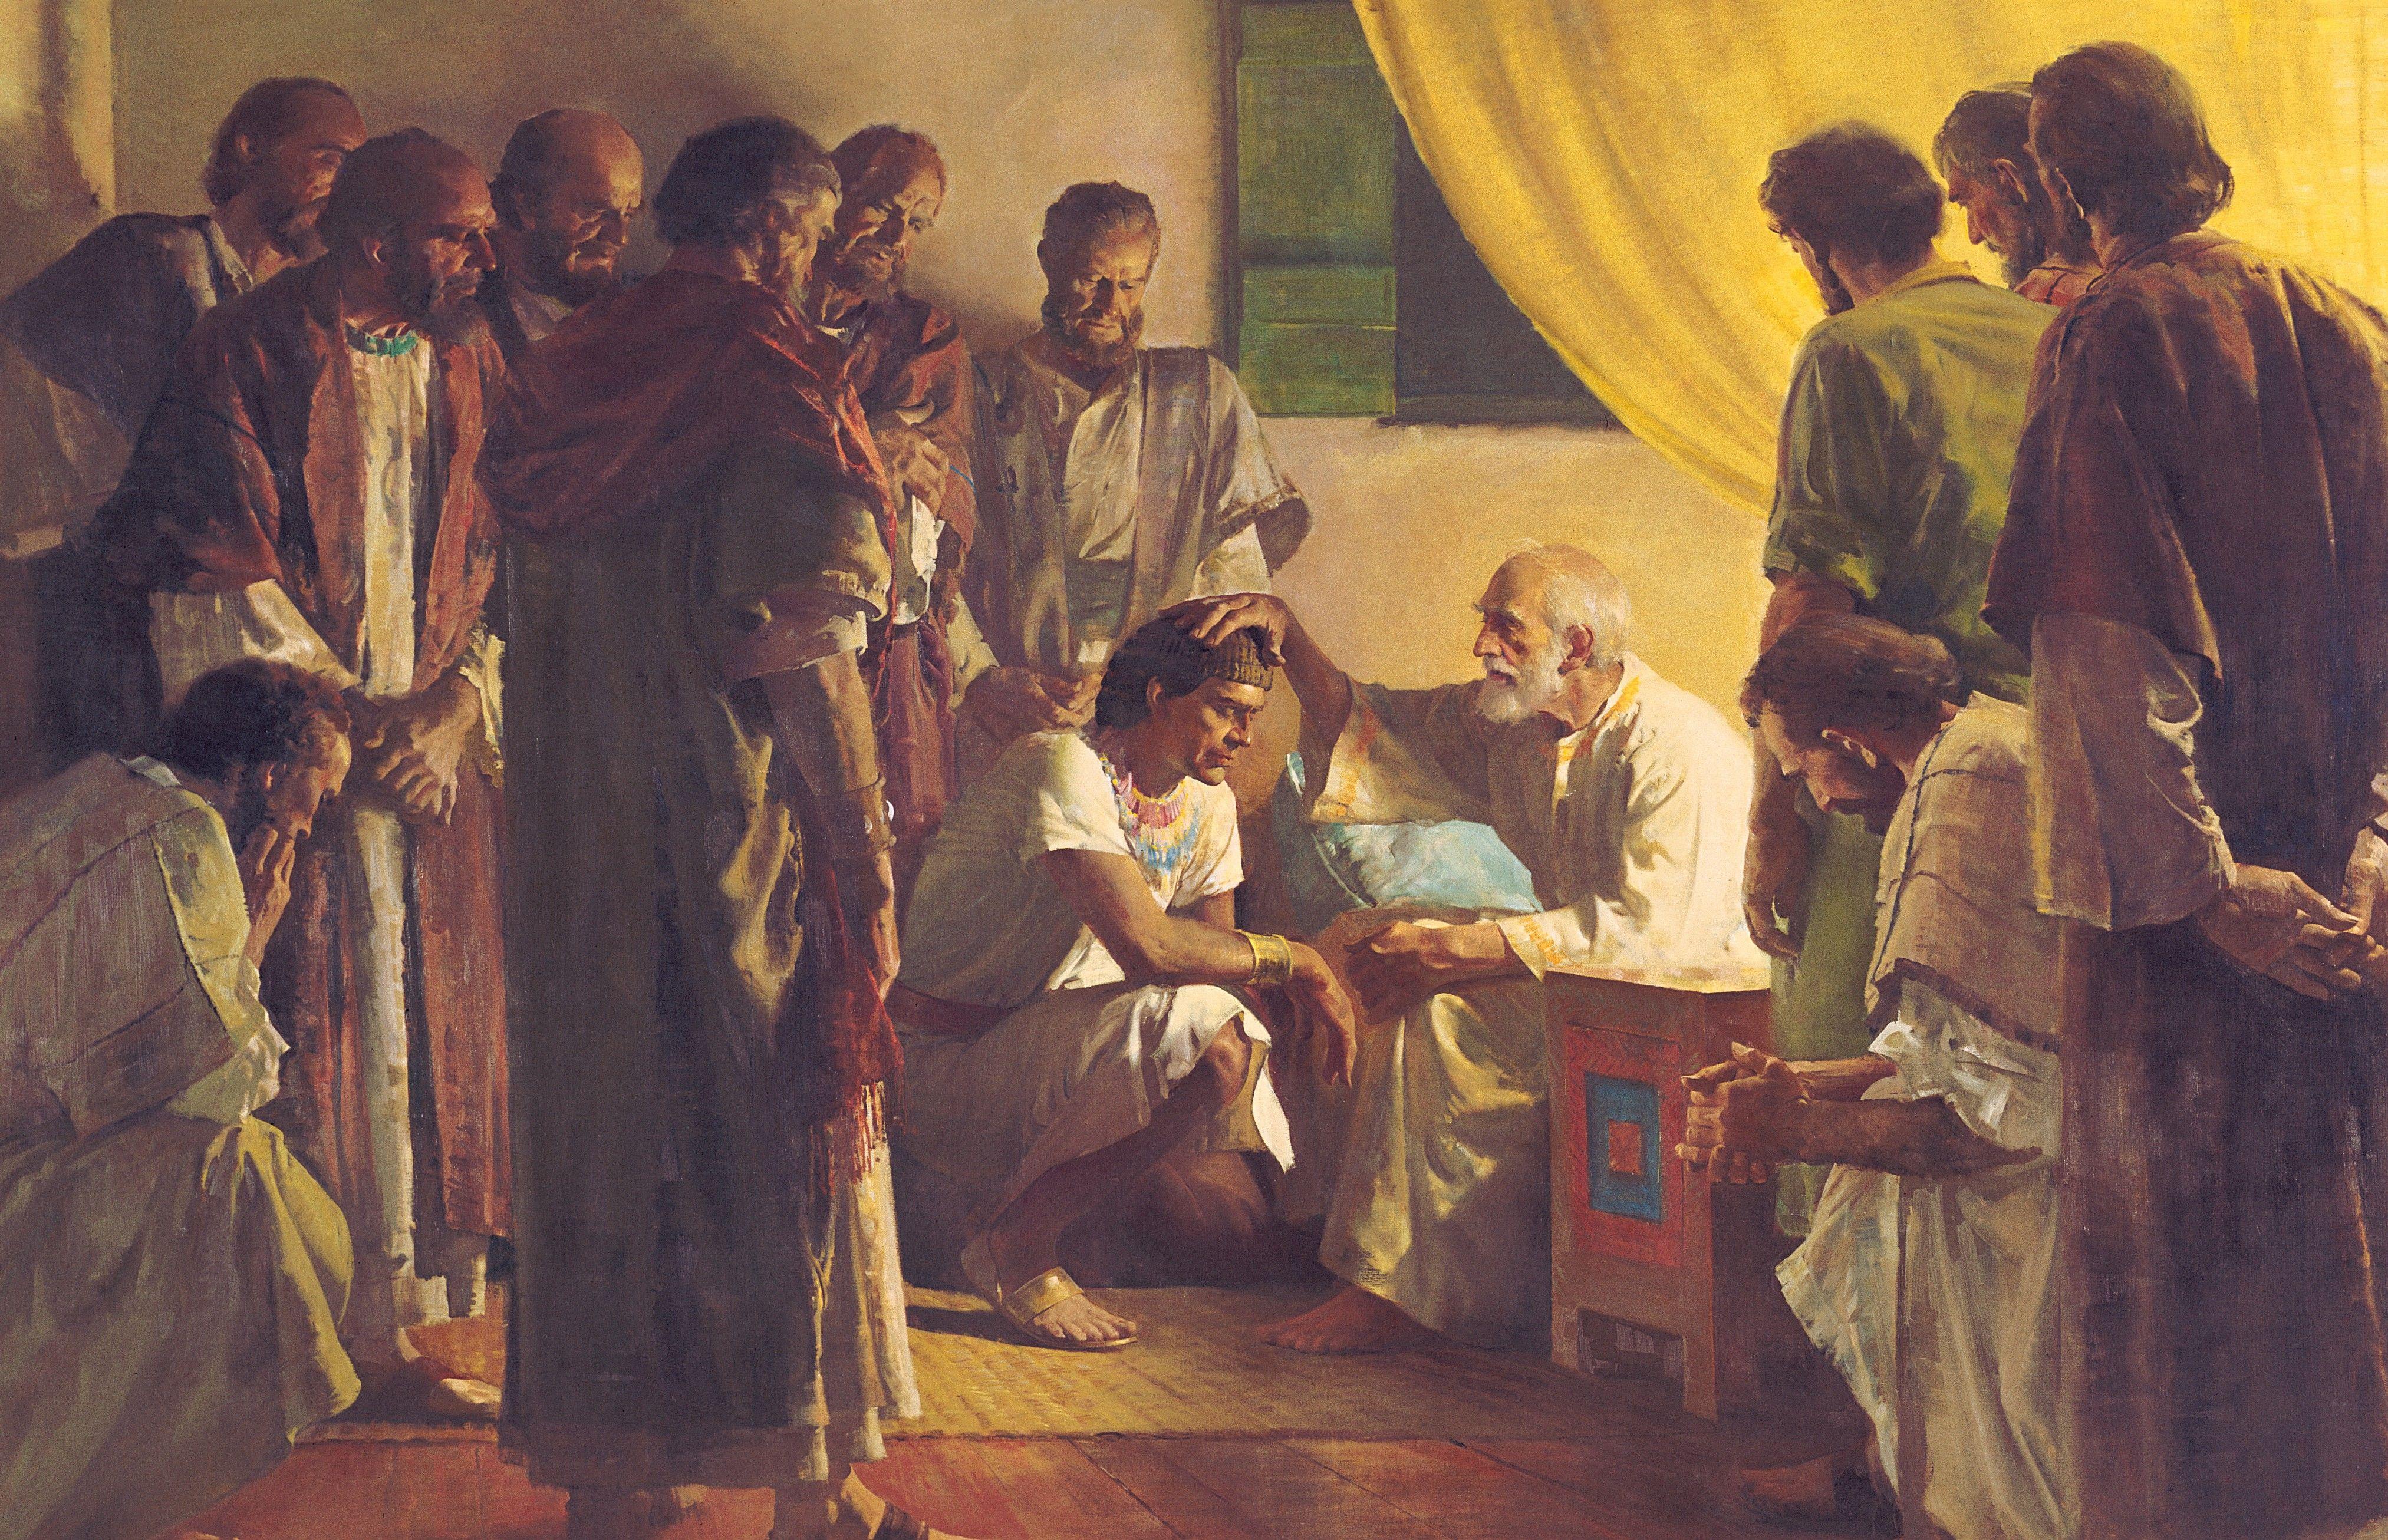 Jacob Blessing His Sons (Jacob Blessing Joseph), by Harry Anderson; GAK 122; GAB 12; Genesis 49